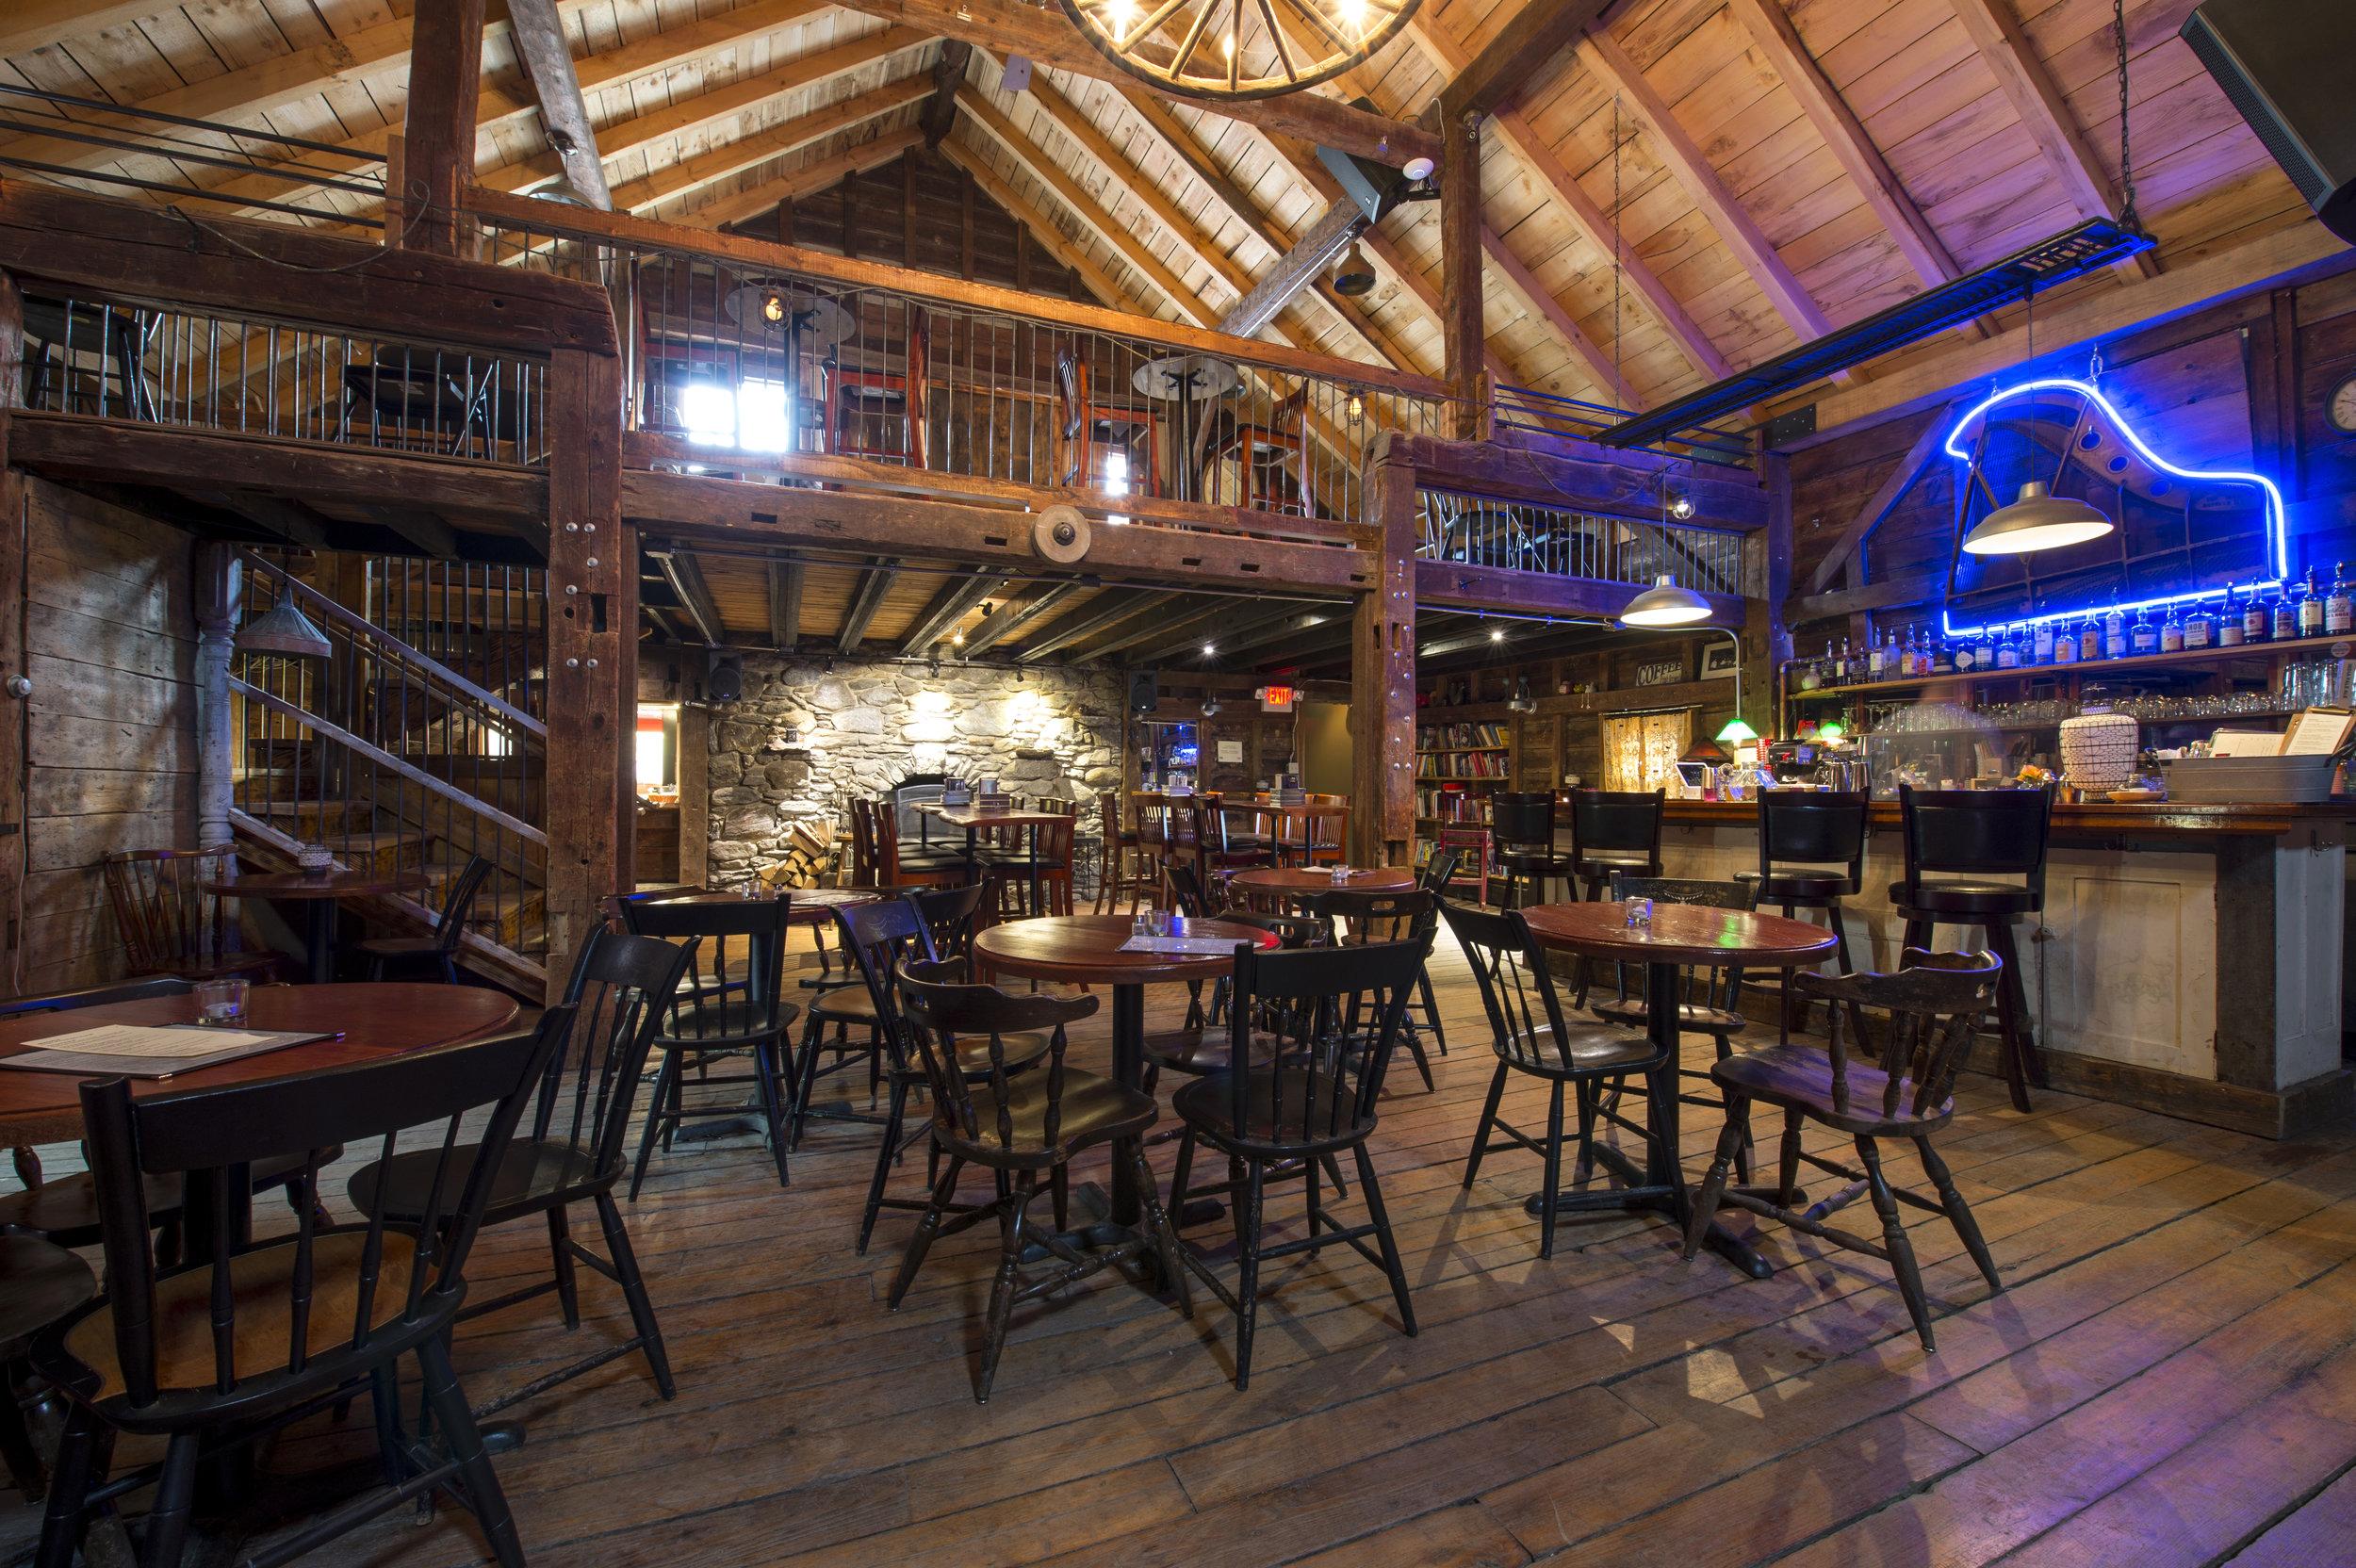 The Egremont Barn